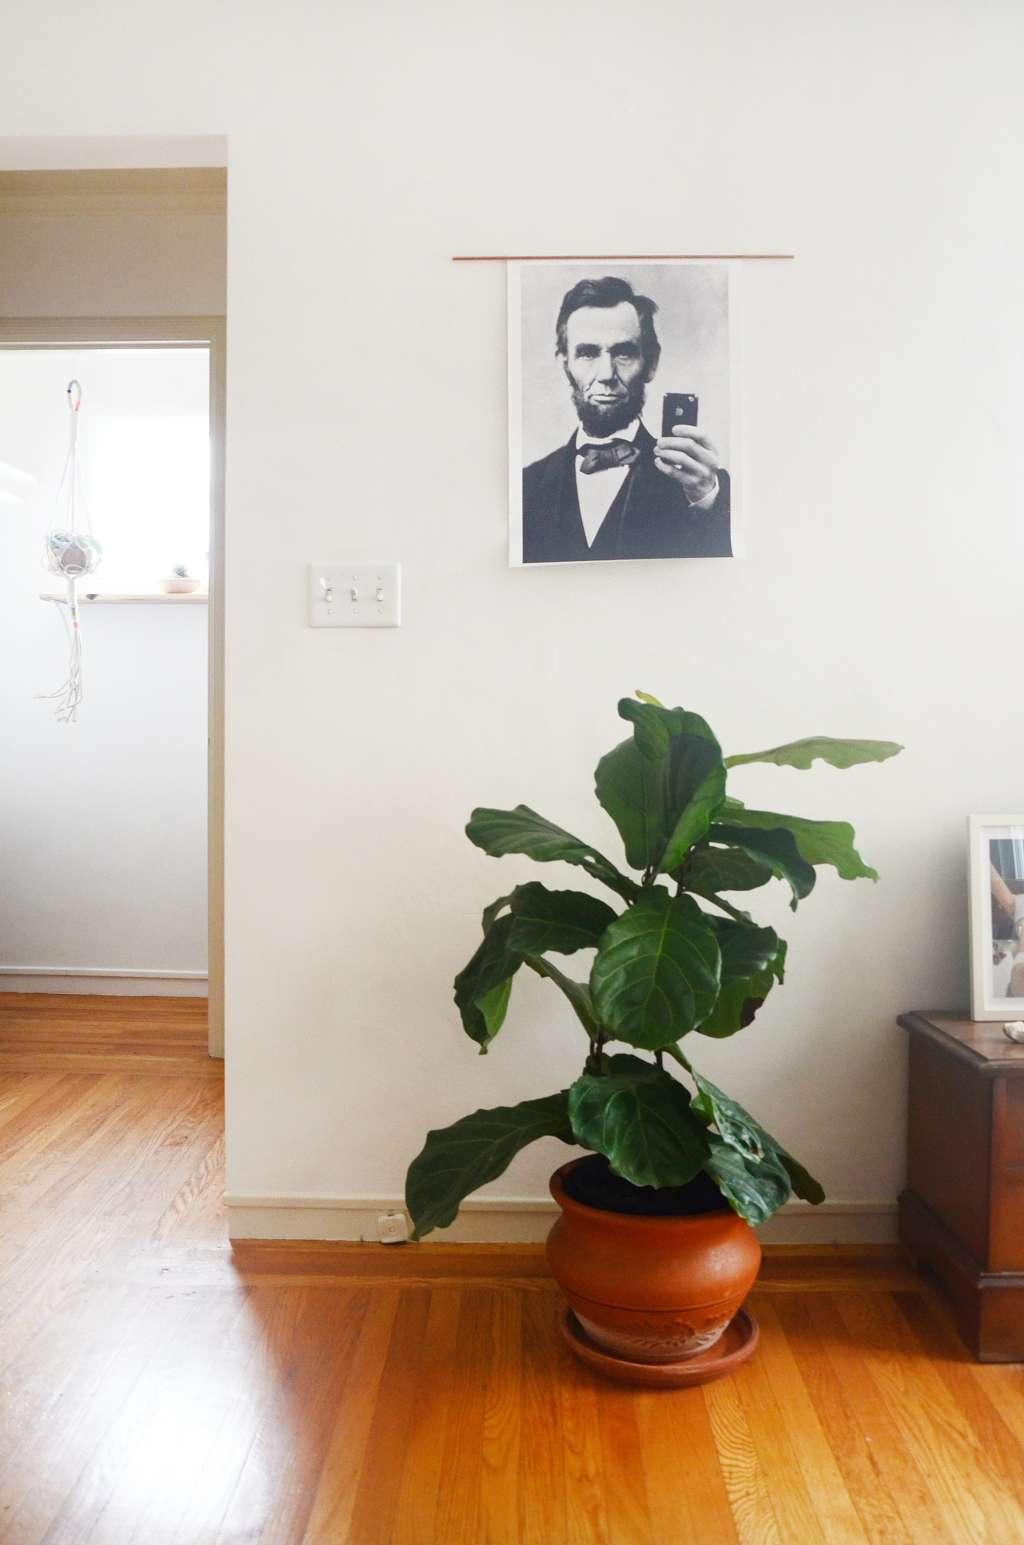 New Home Decor Plant Trend: The Pothos Plant